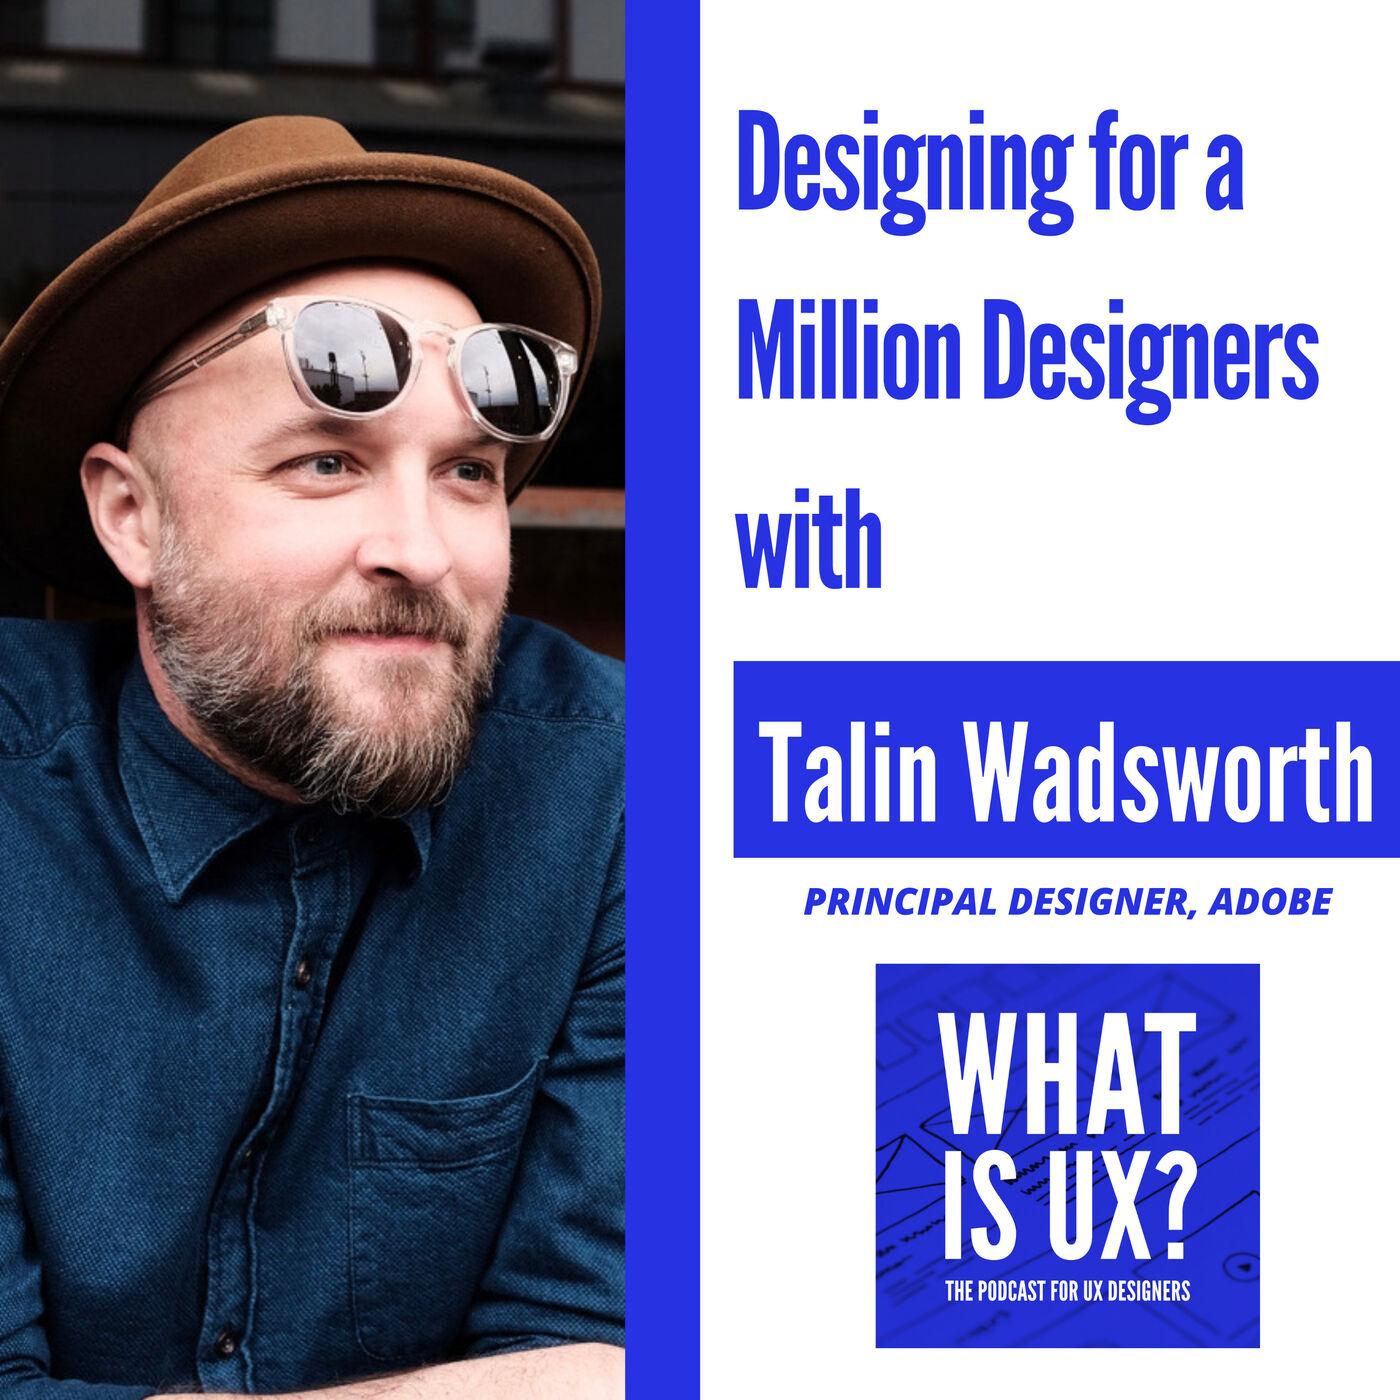 S1E1 Designing for 1 Million Designers with Talin Wadsworth, Principal Designer at Adobe XD